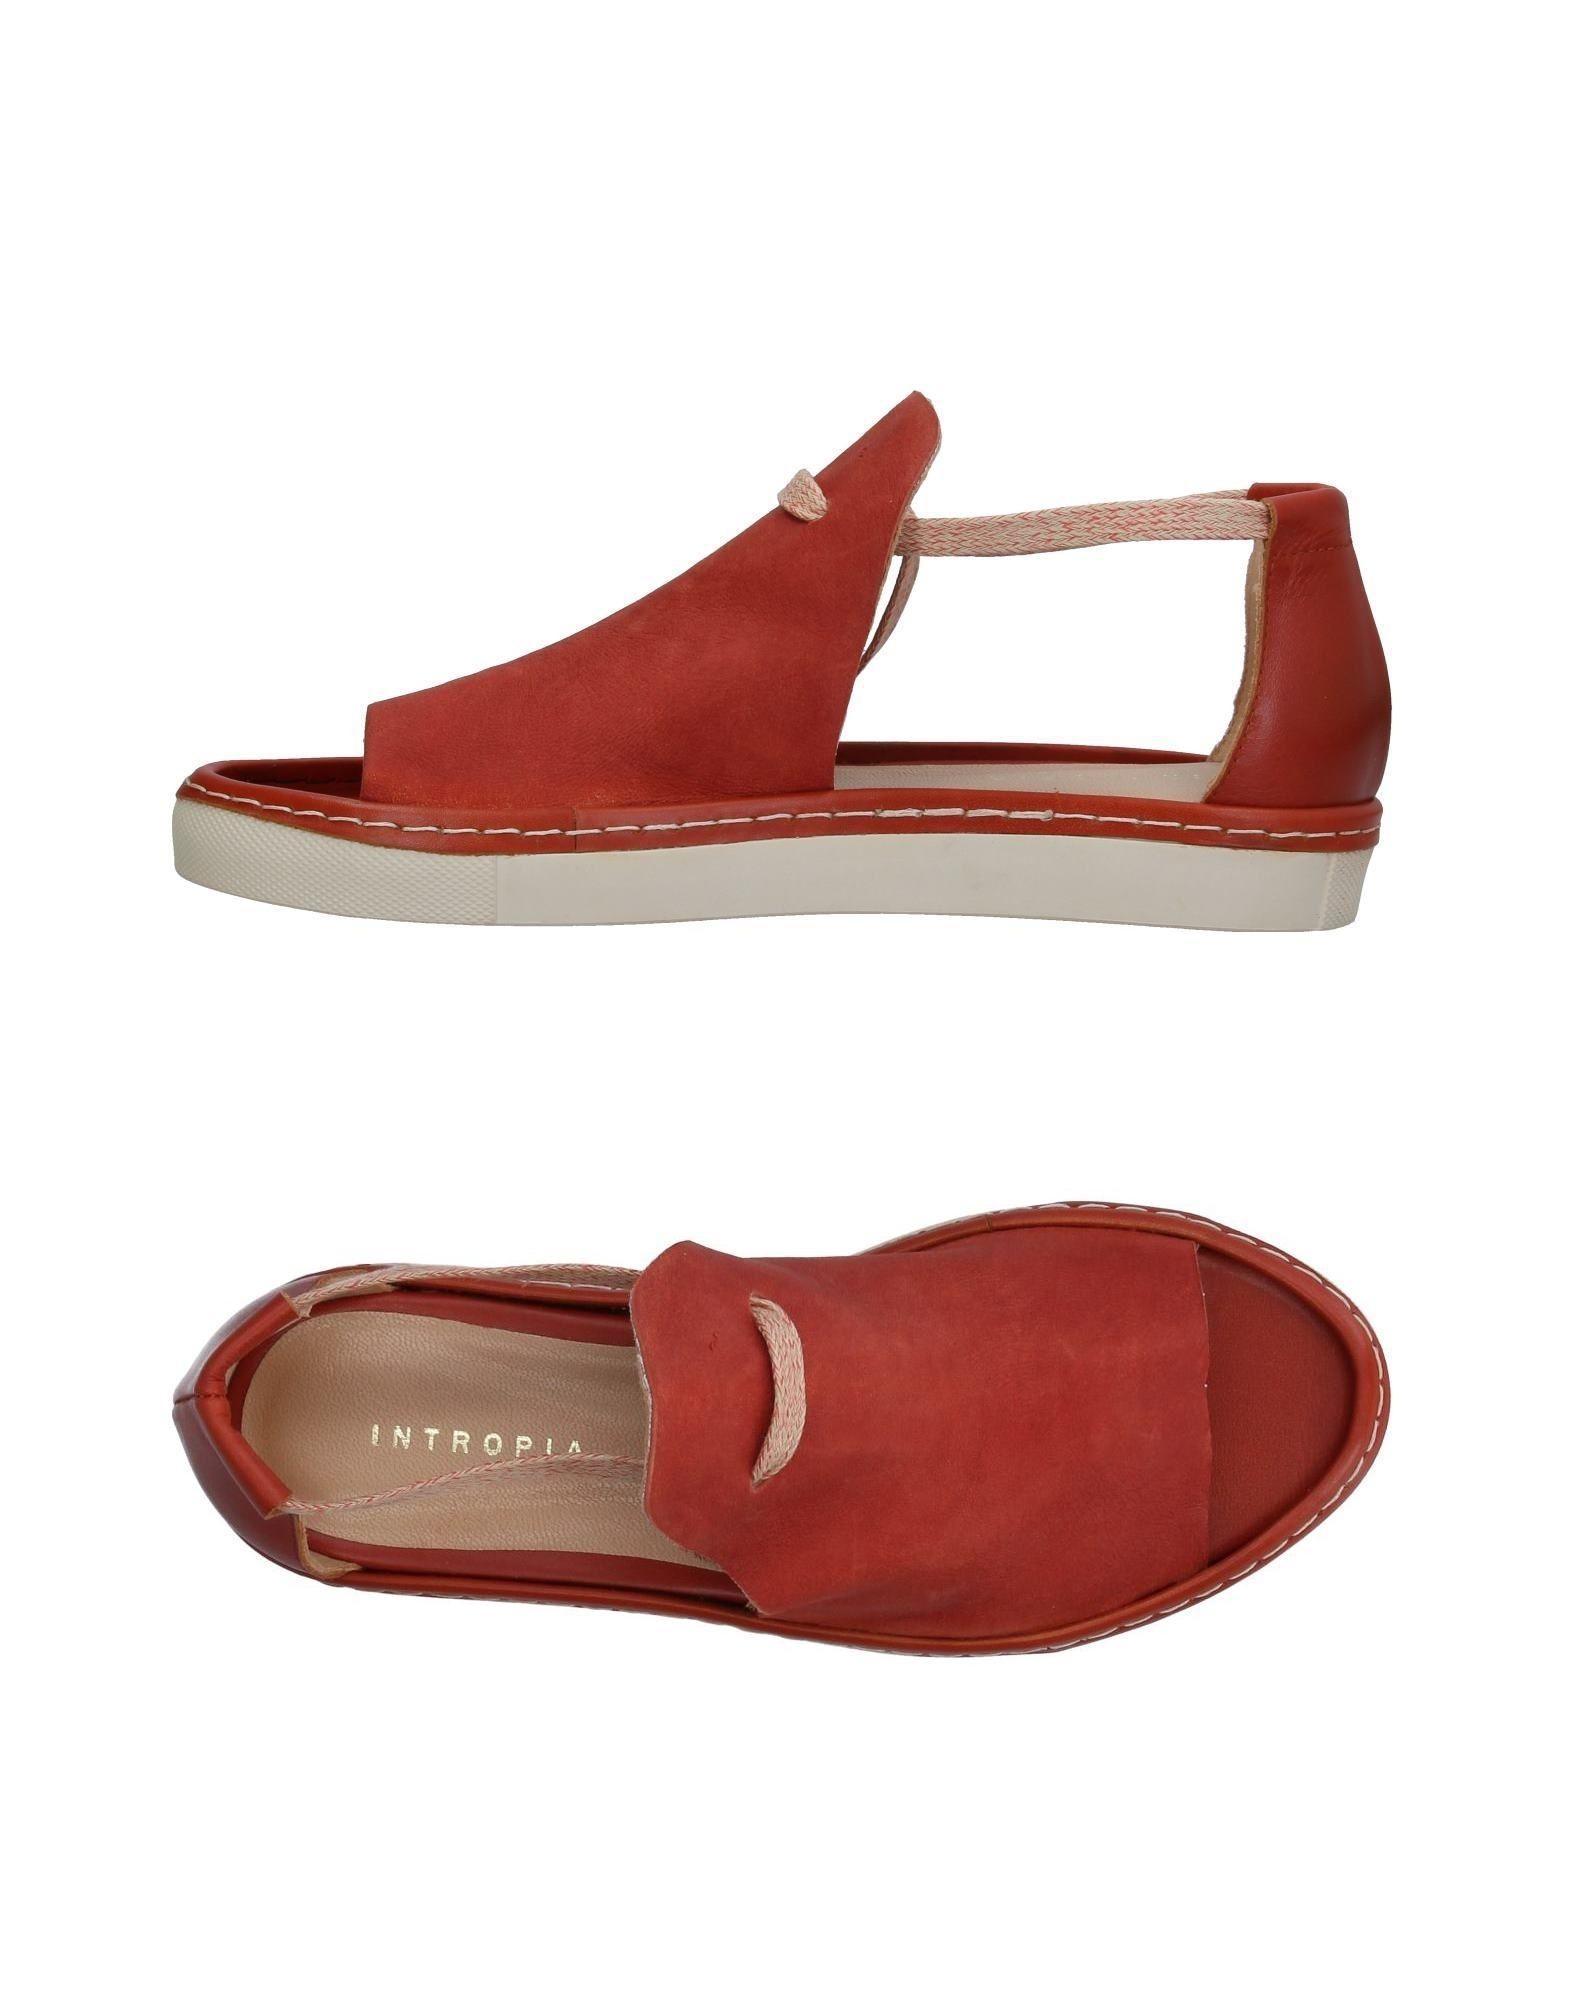 Intropia Sandals In Brick Red